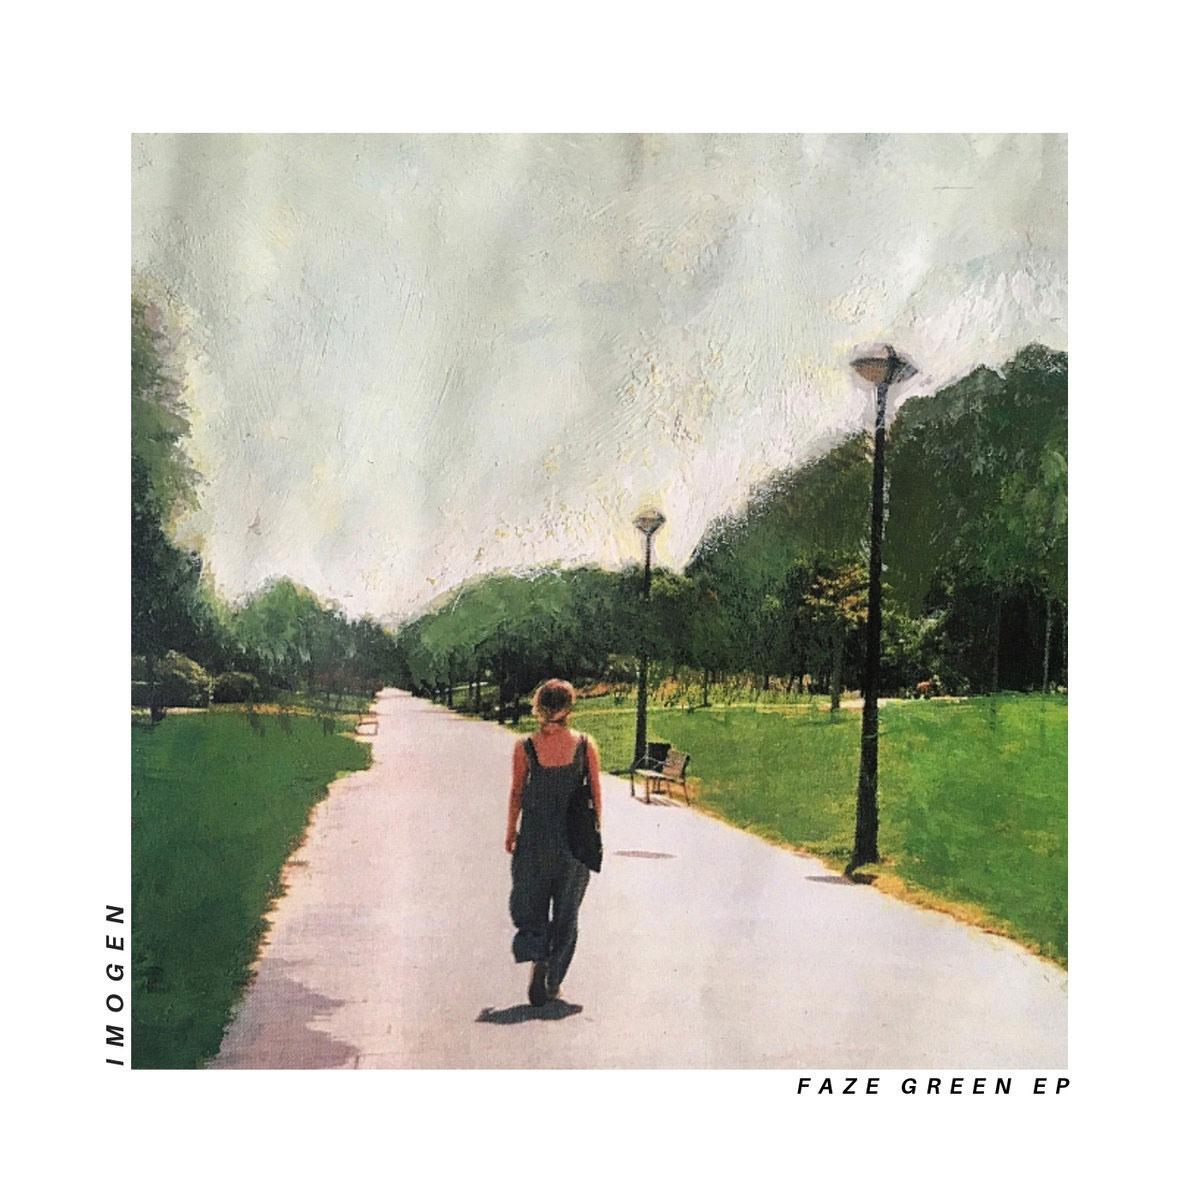 Faze Green (EP) - IMOGEN